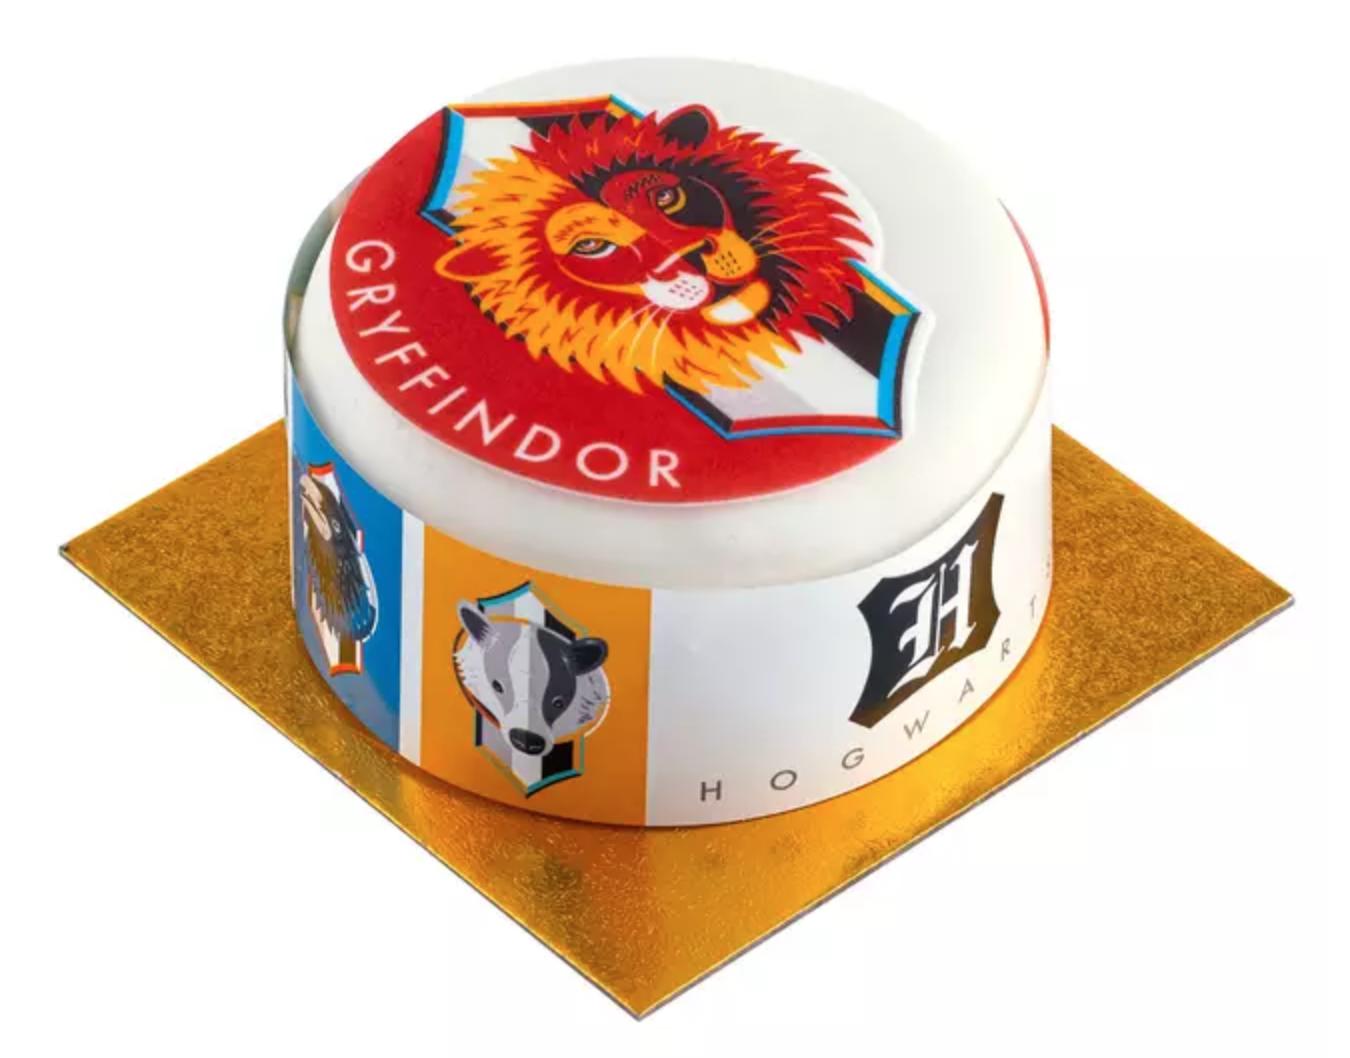 Gryffindor-themed cake.